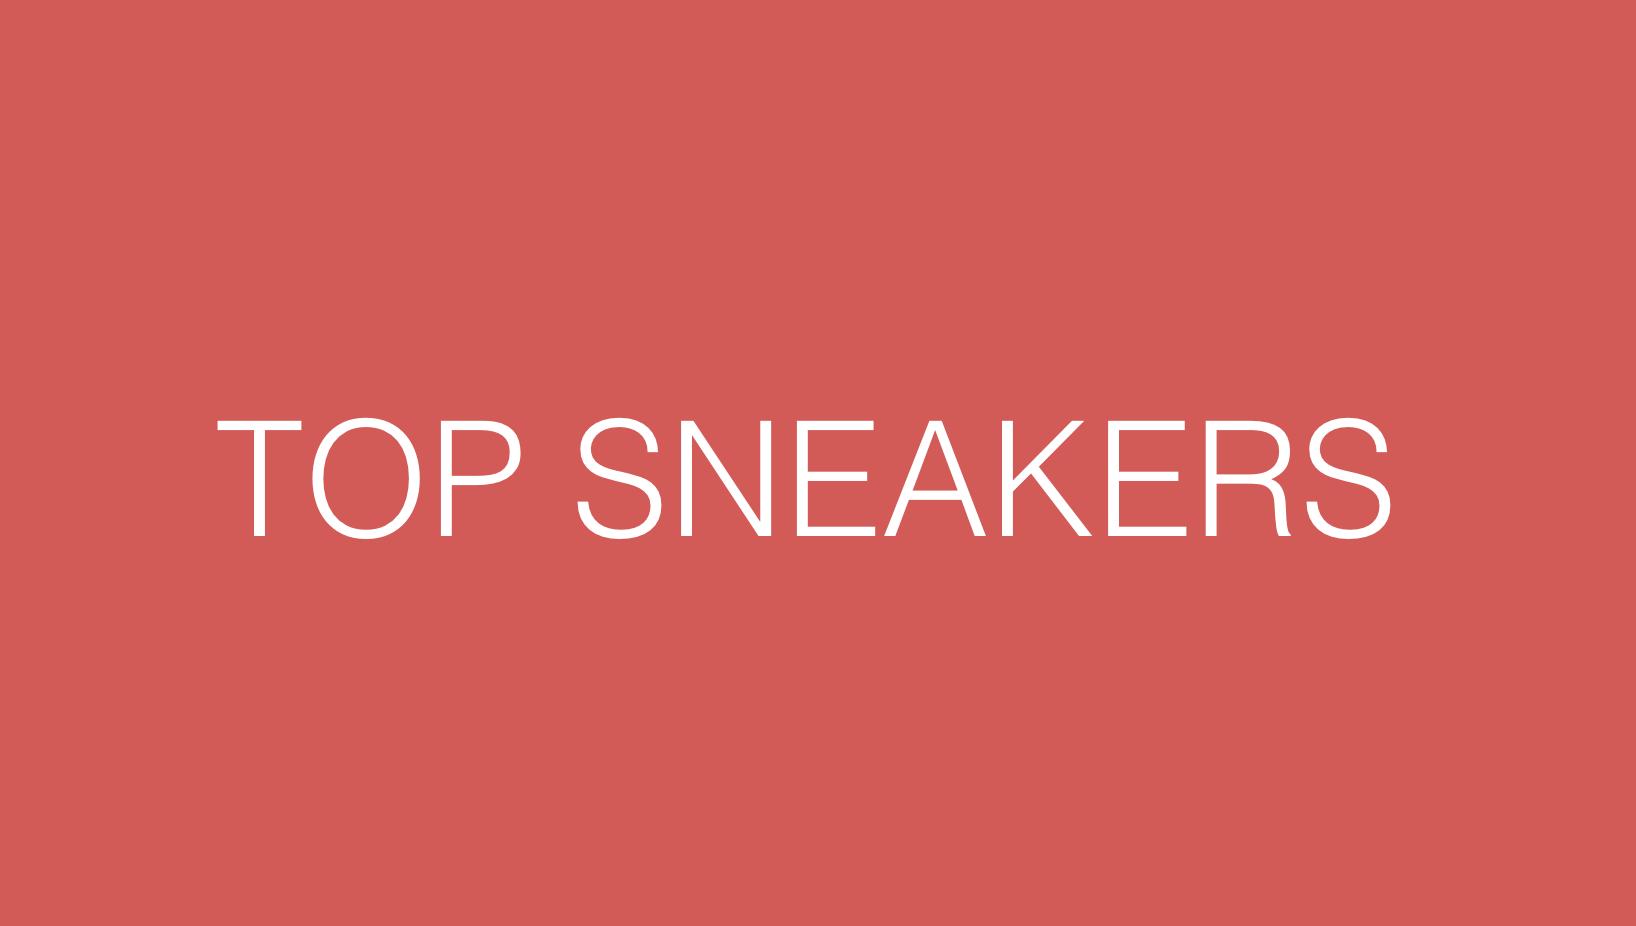 Top sneakers